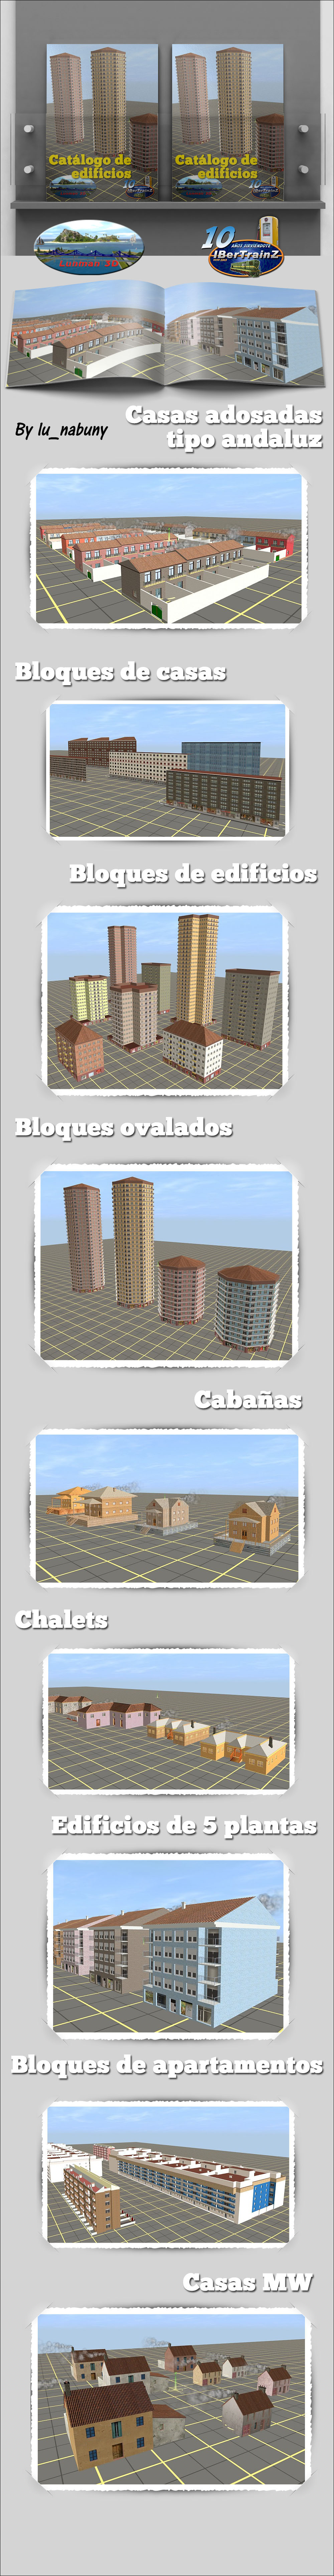 edificios_pres